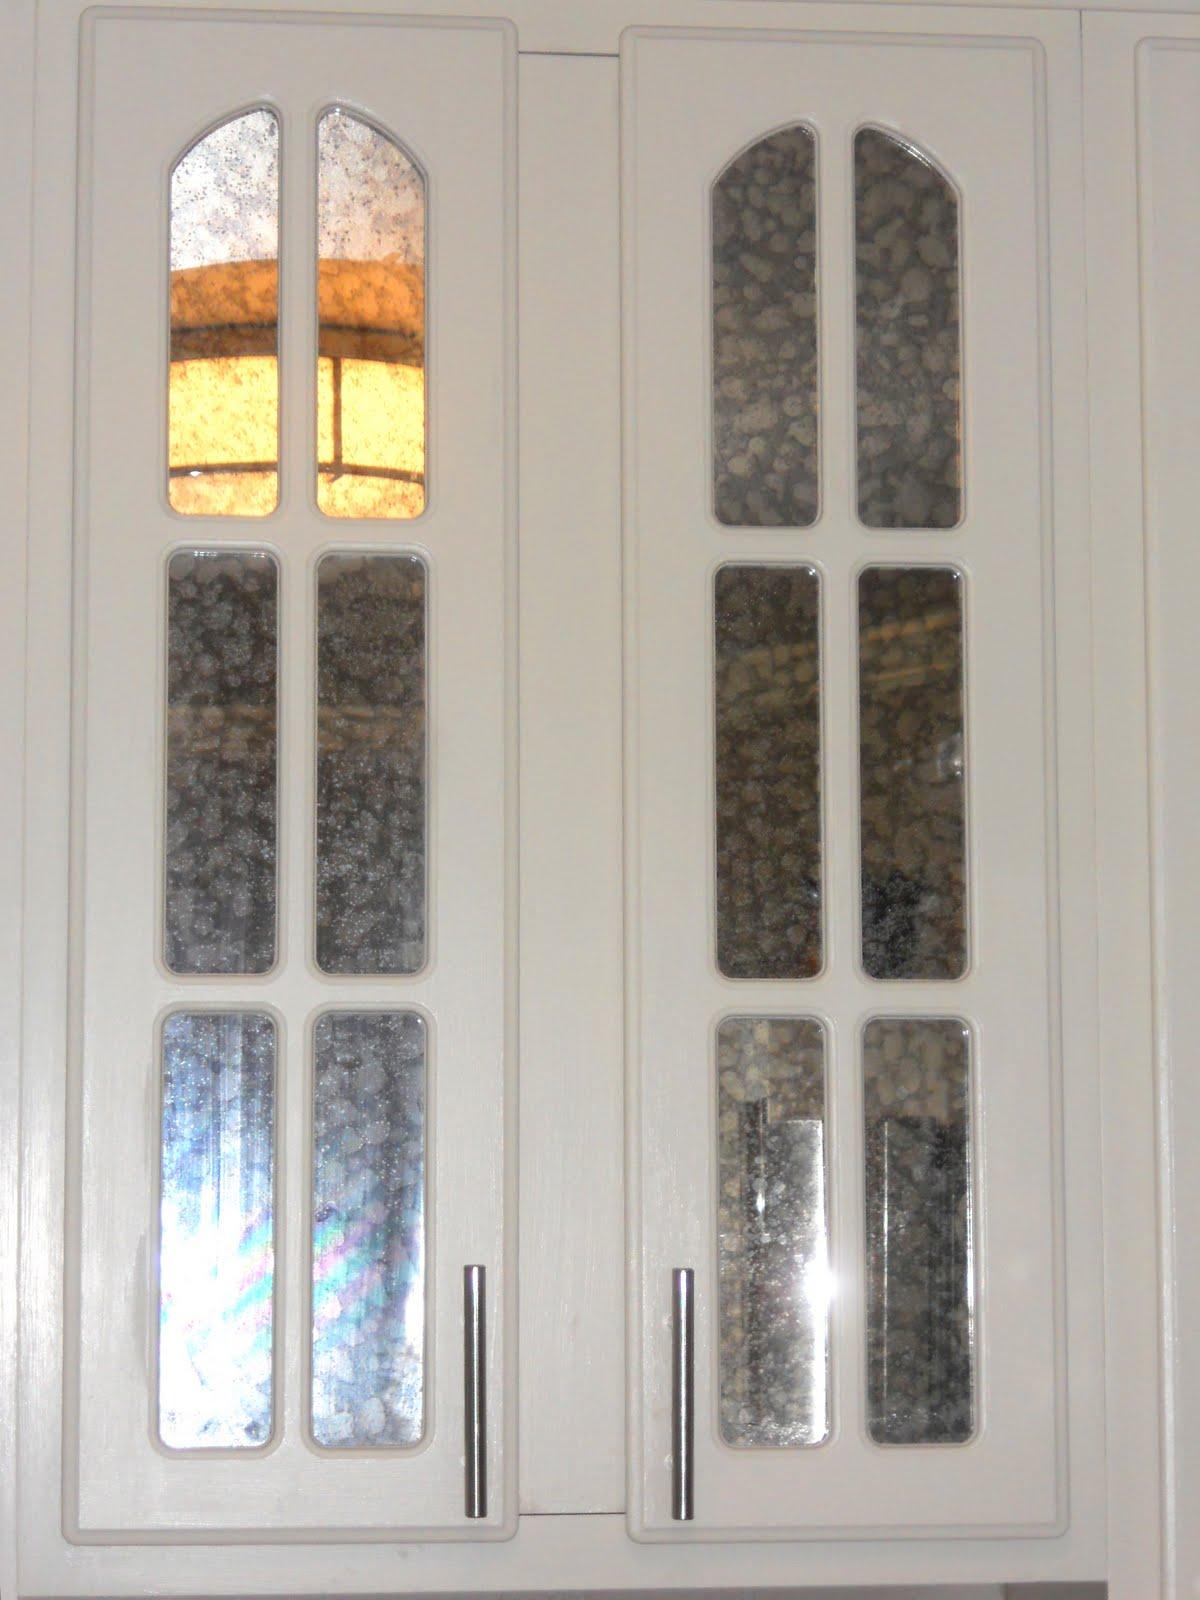 Awe Inspiring Haddon Musing The Magic Of Mirrors Download Free Architecture Designs Embacsunscenecom